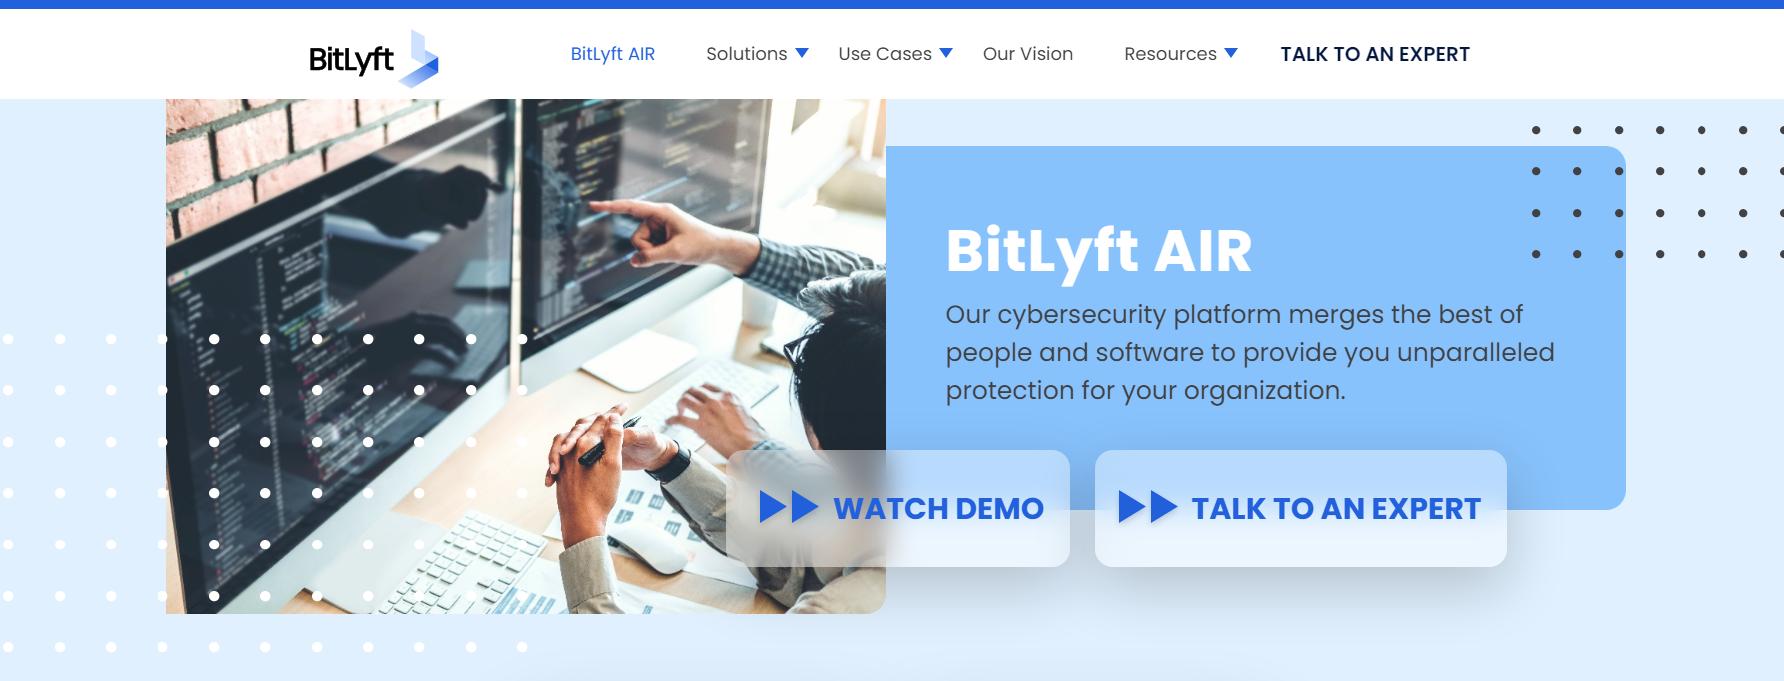 New BitLyft website banner